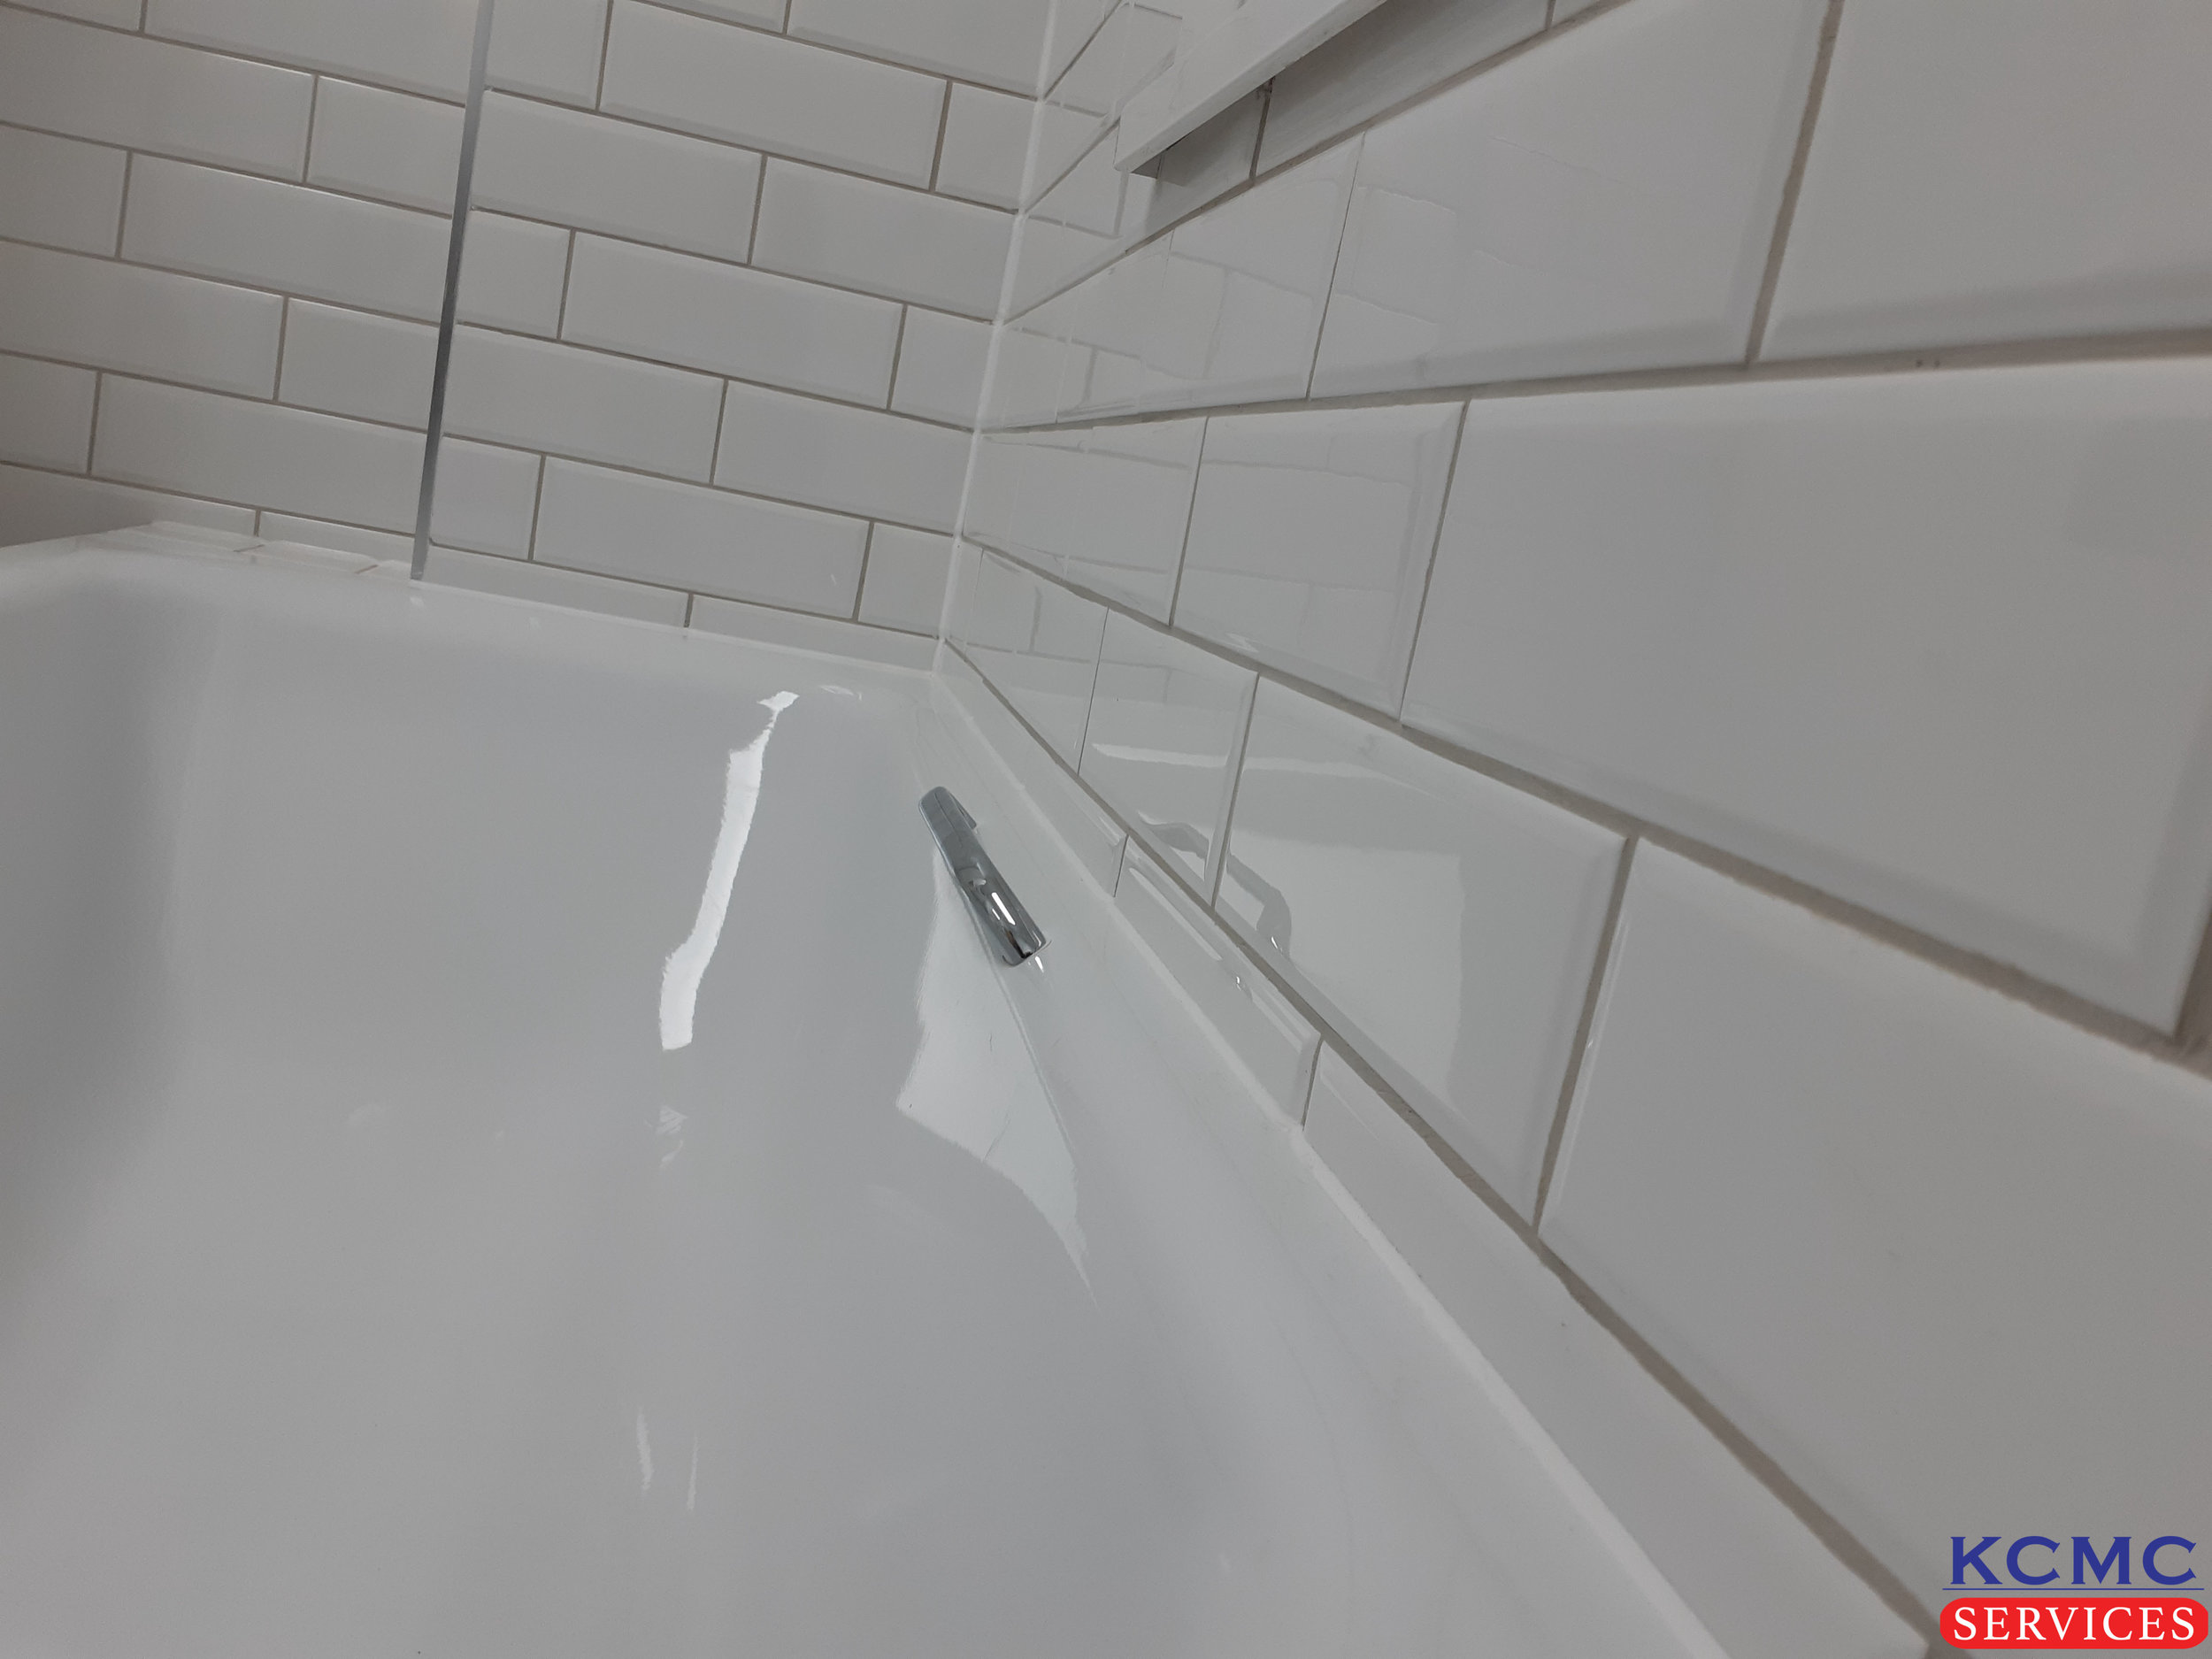 KCMC Services bath SE6-15.jpg